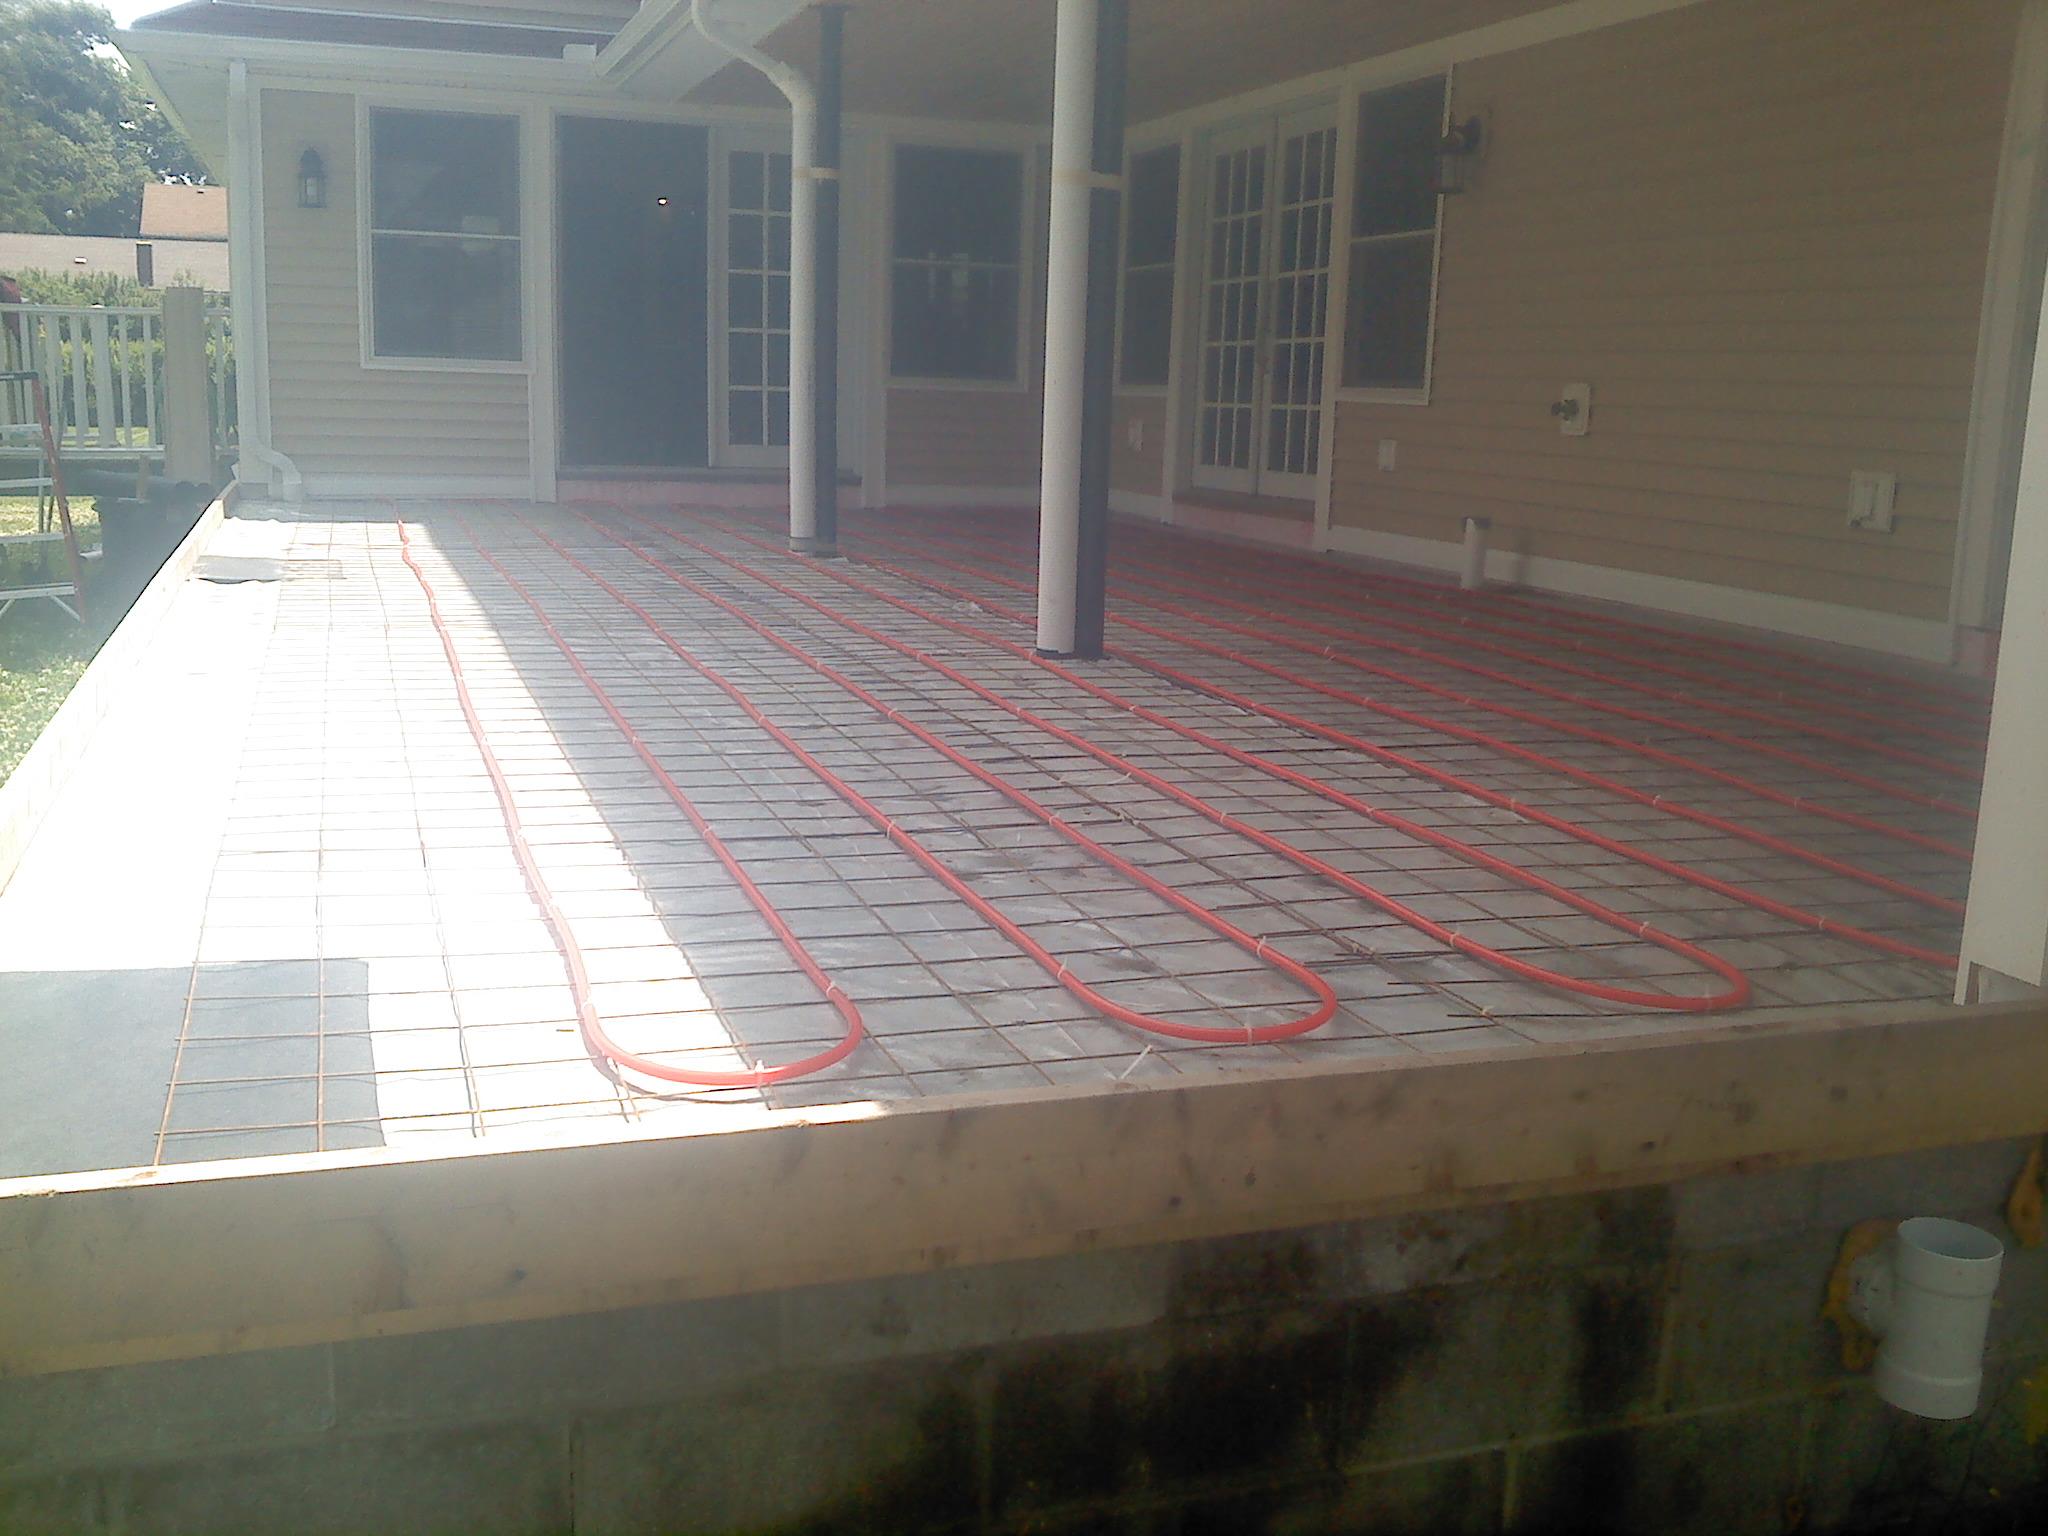 New Stamped Concrete Porch w Heated Floor Prep Work